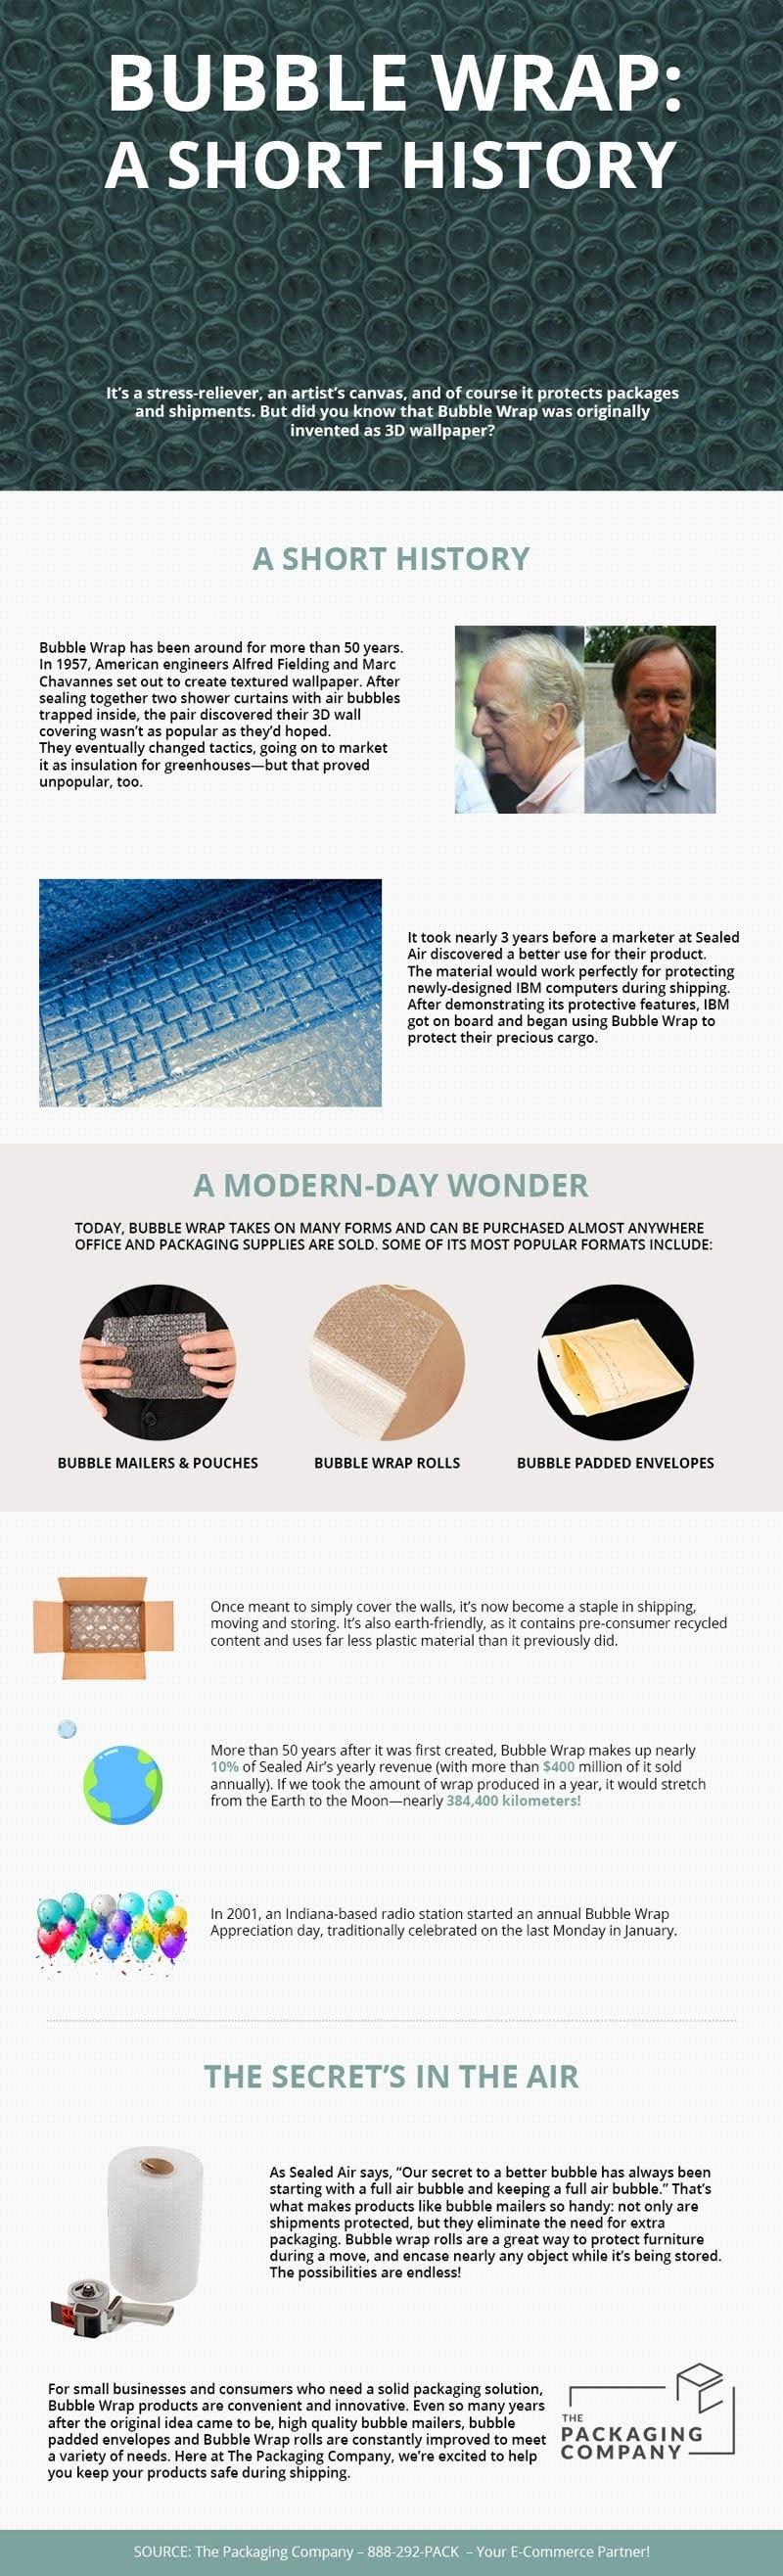 Bubble Wrap: A Short History #infographic